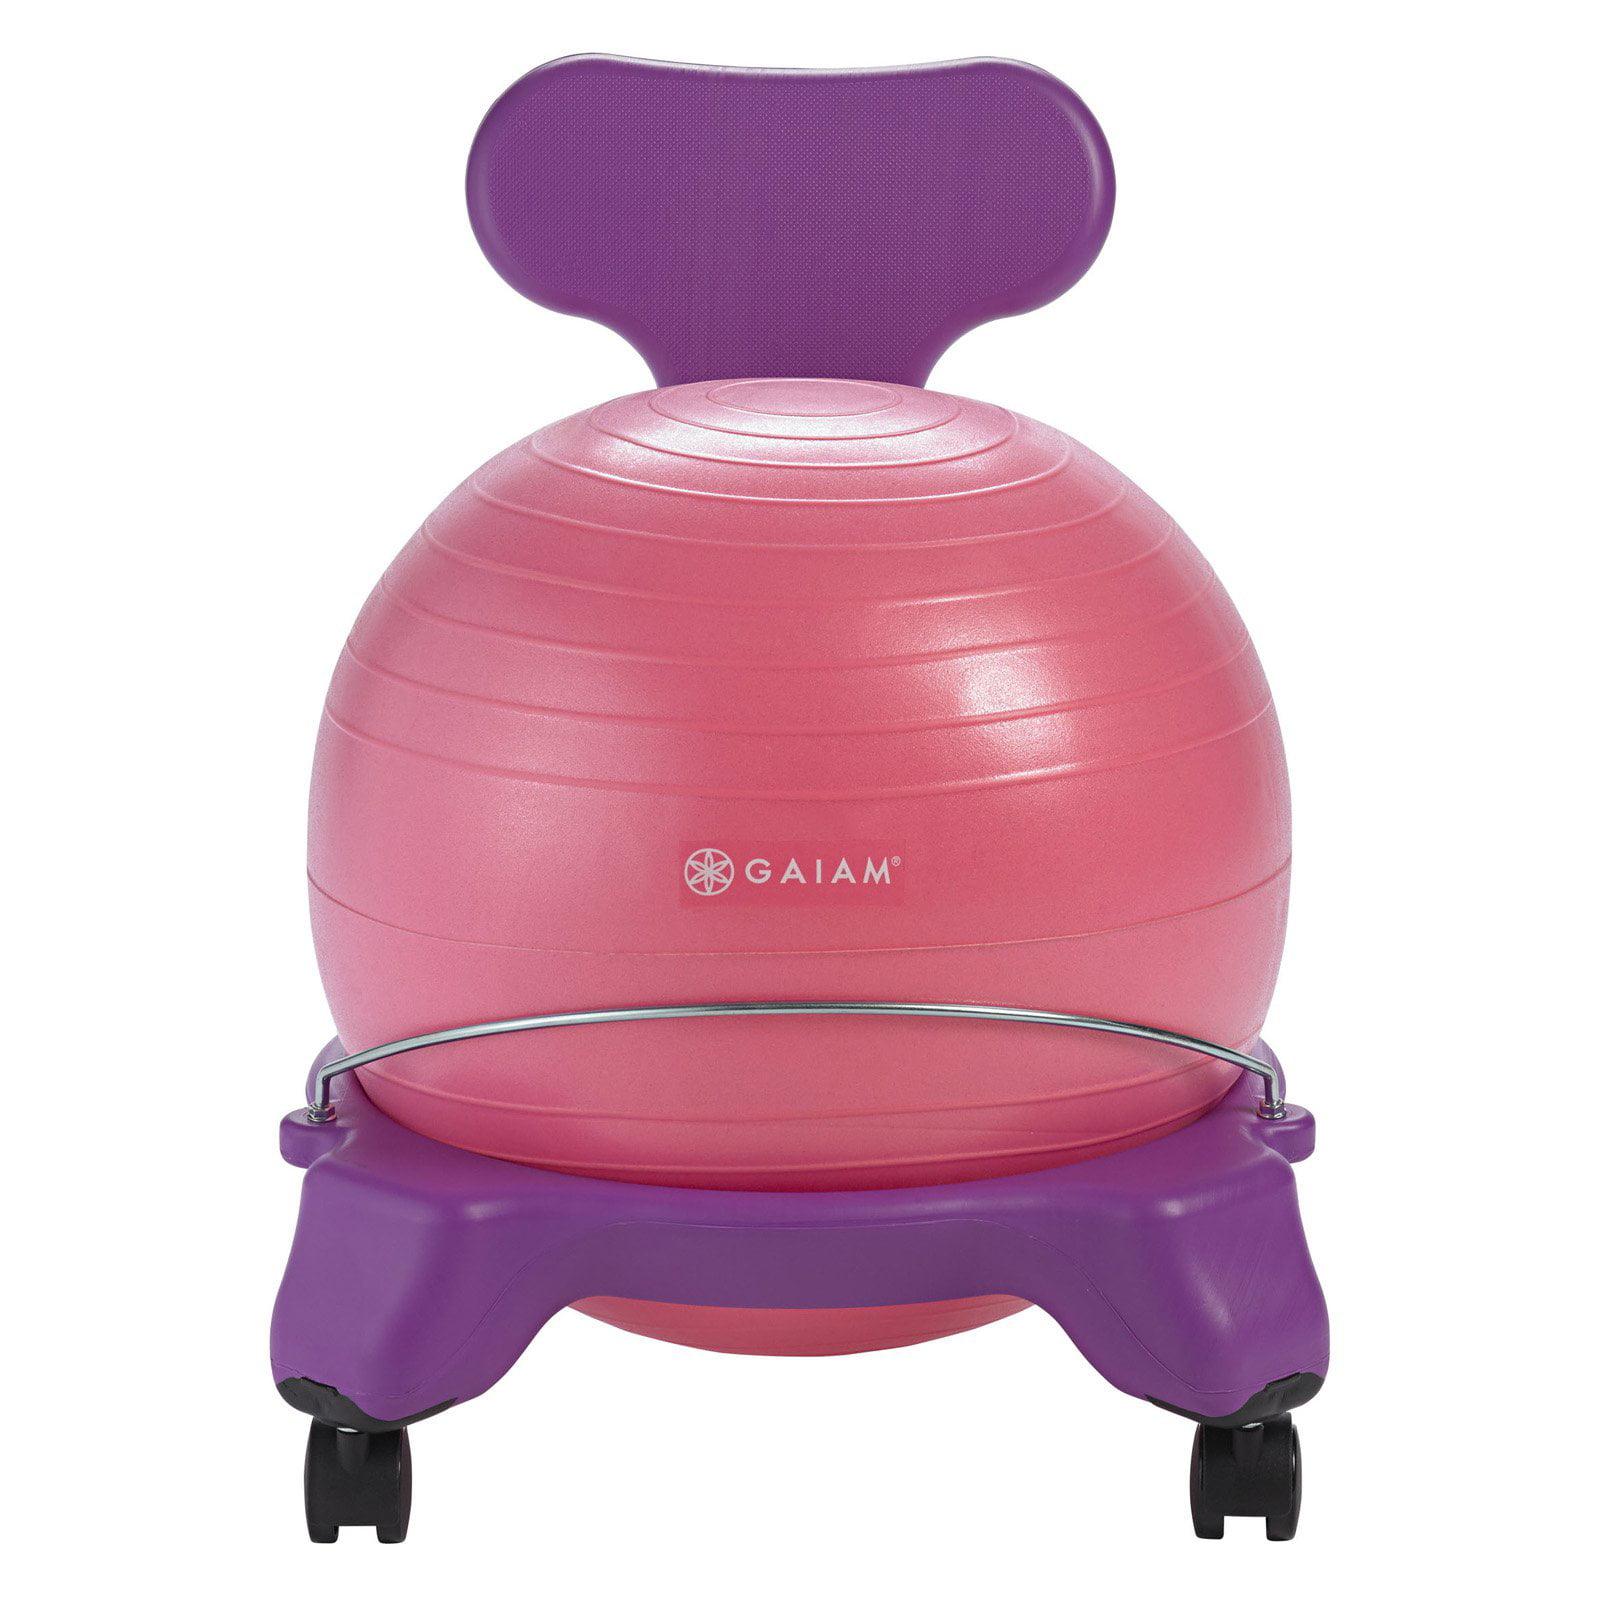 Gaiam Kids Balance Ball Chair, Purple/Pink